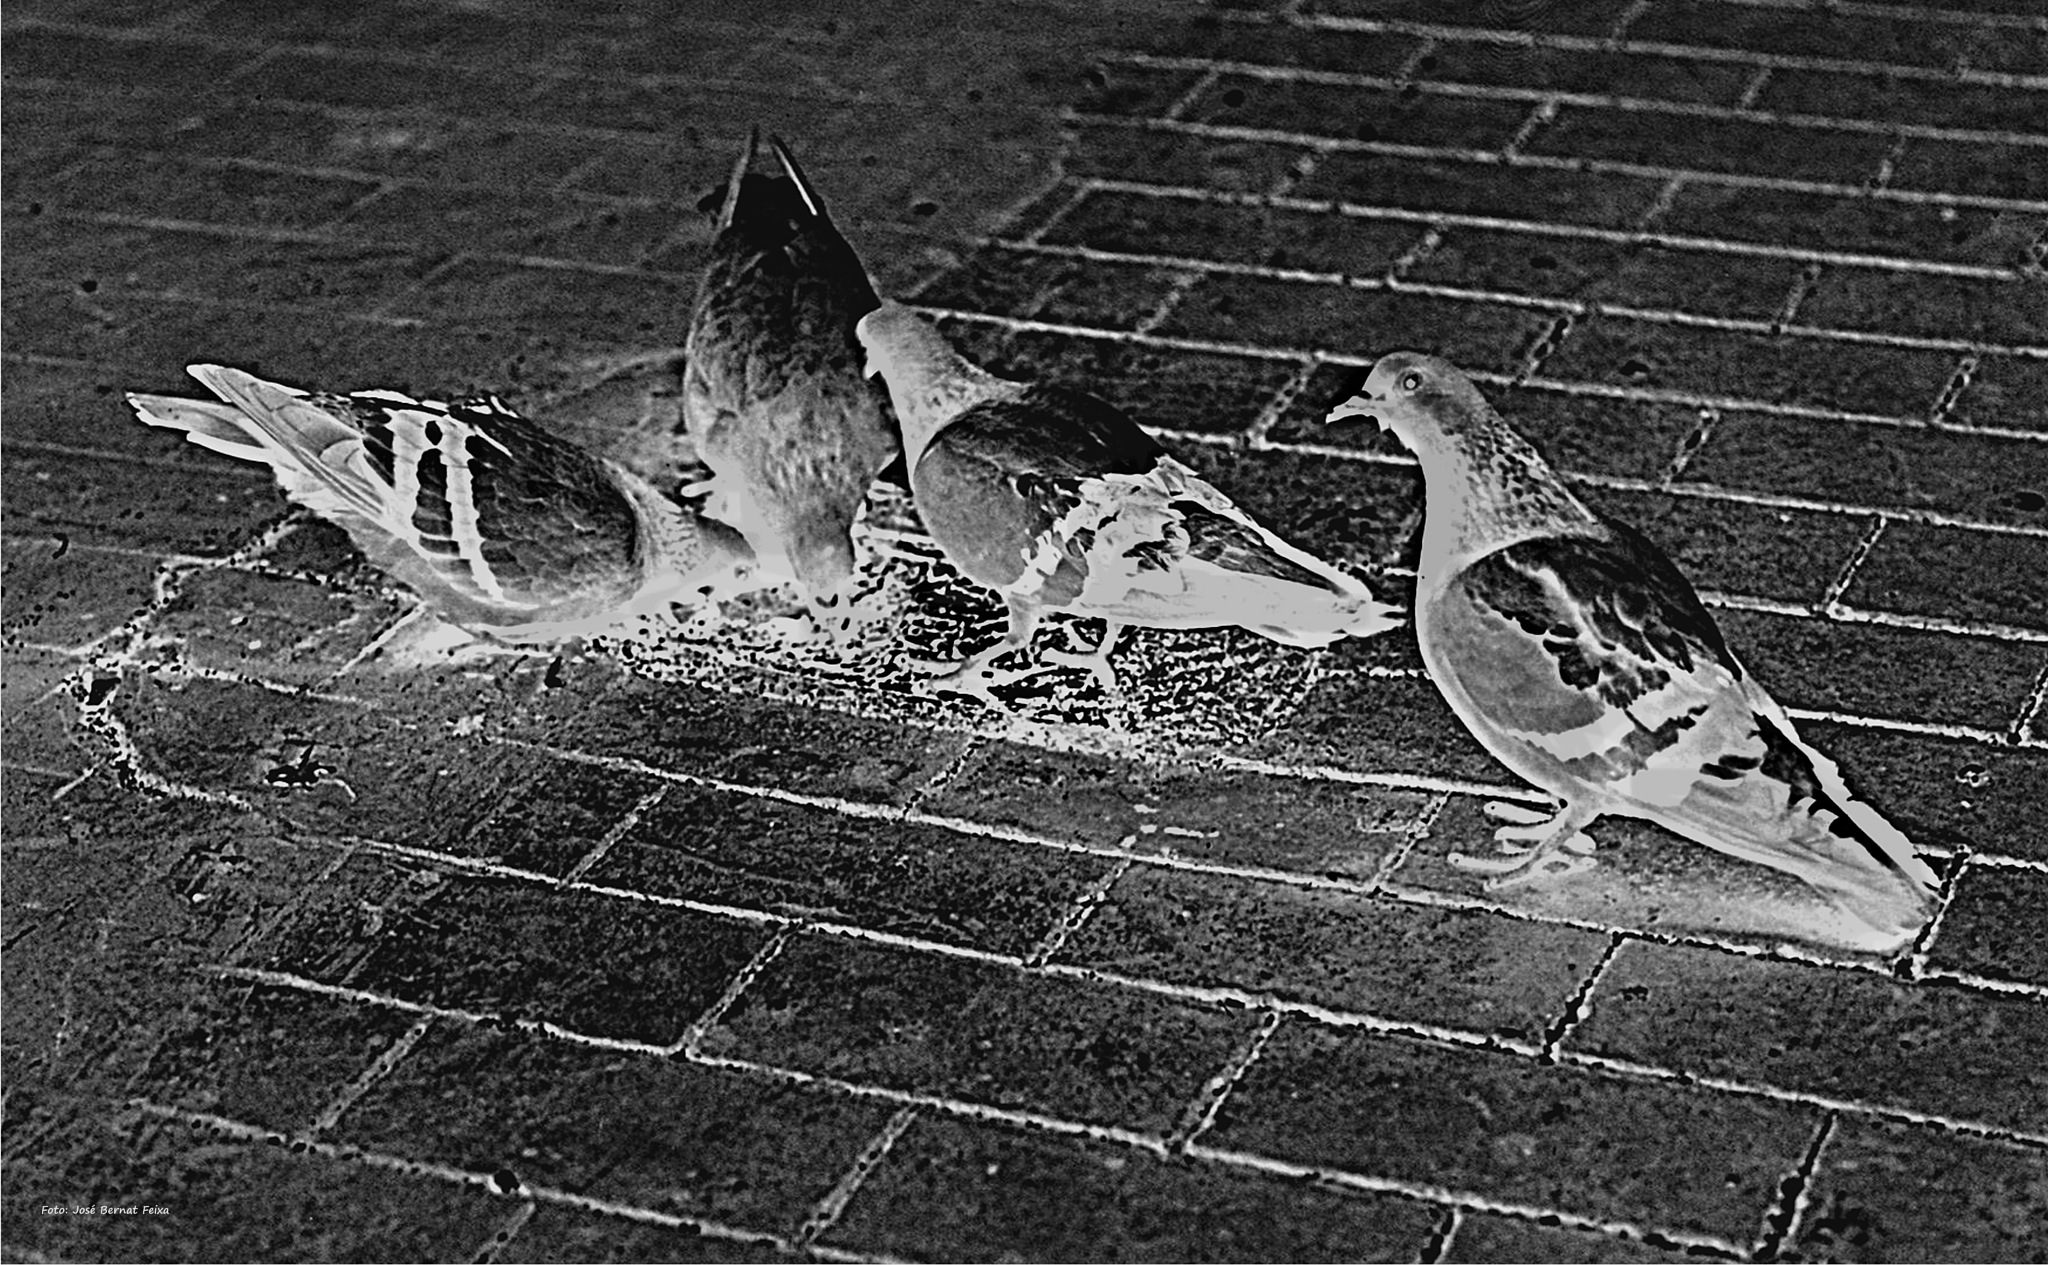 PALOMAS; DUIVEN; PIGEONS (60's) by José Bernat Feixa